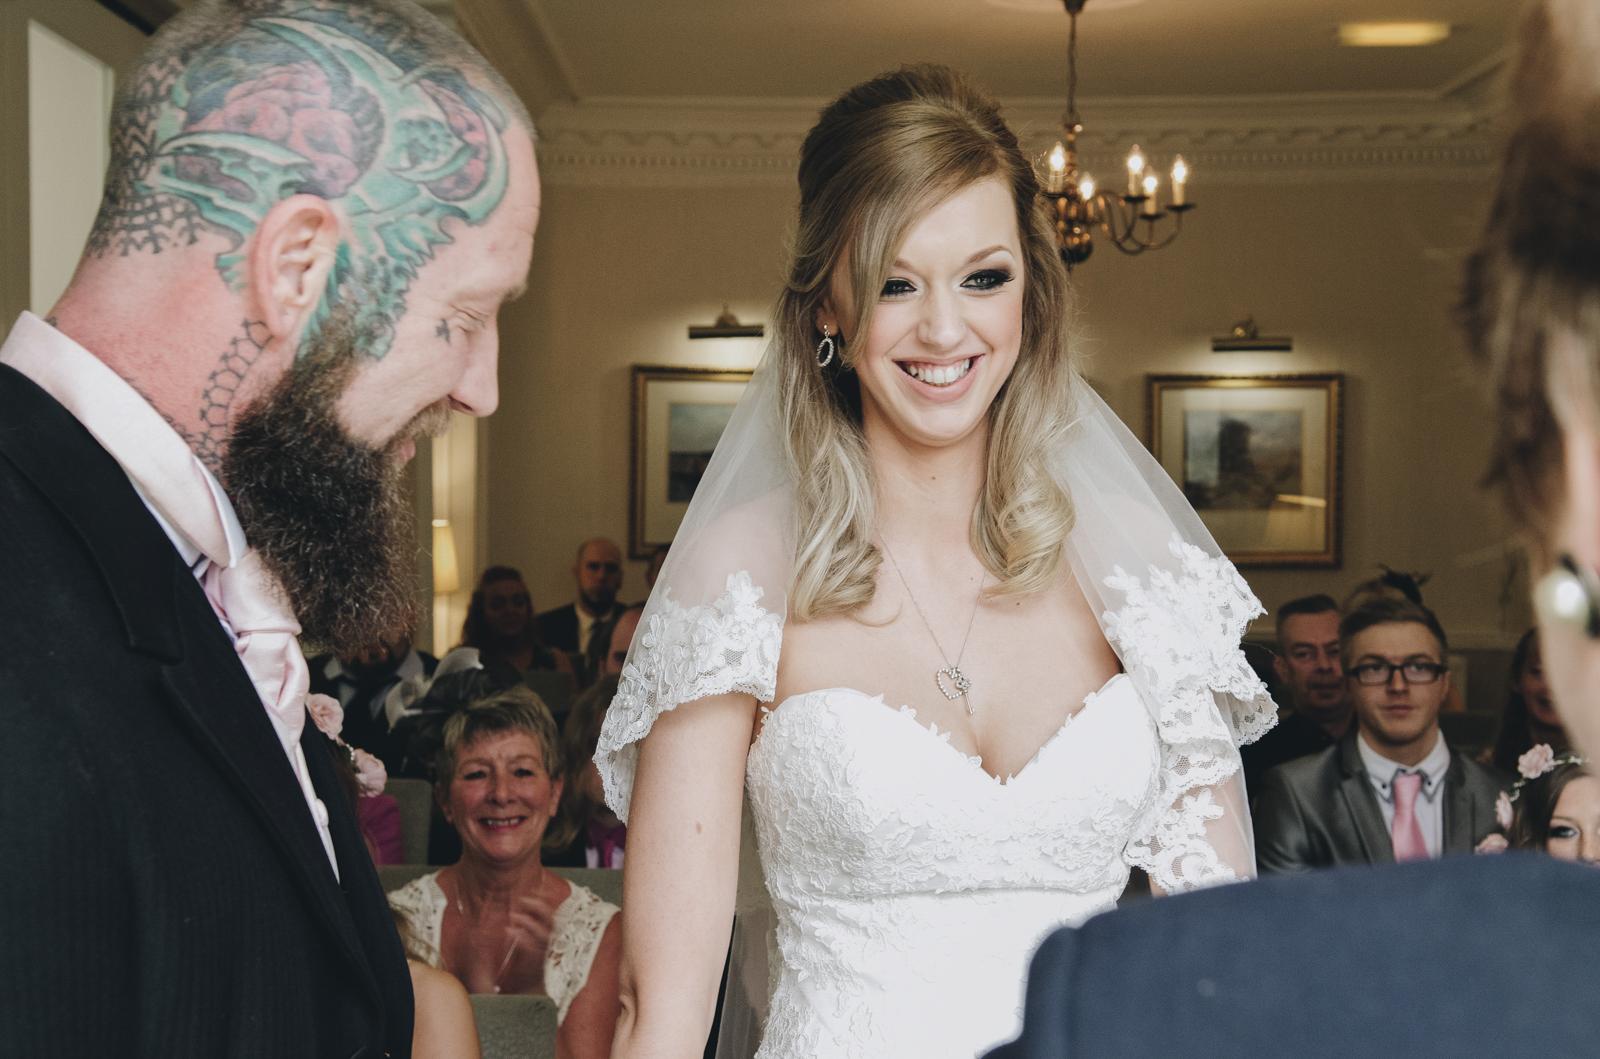 Alternative-North-West-Manchester-Wedding-Photography-Astley-bank-Wedding-skull-cake-tattooed-groom-9.jpg